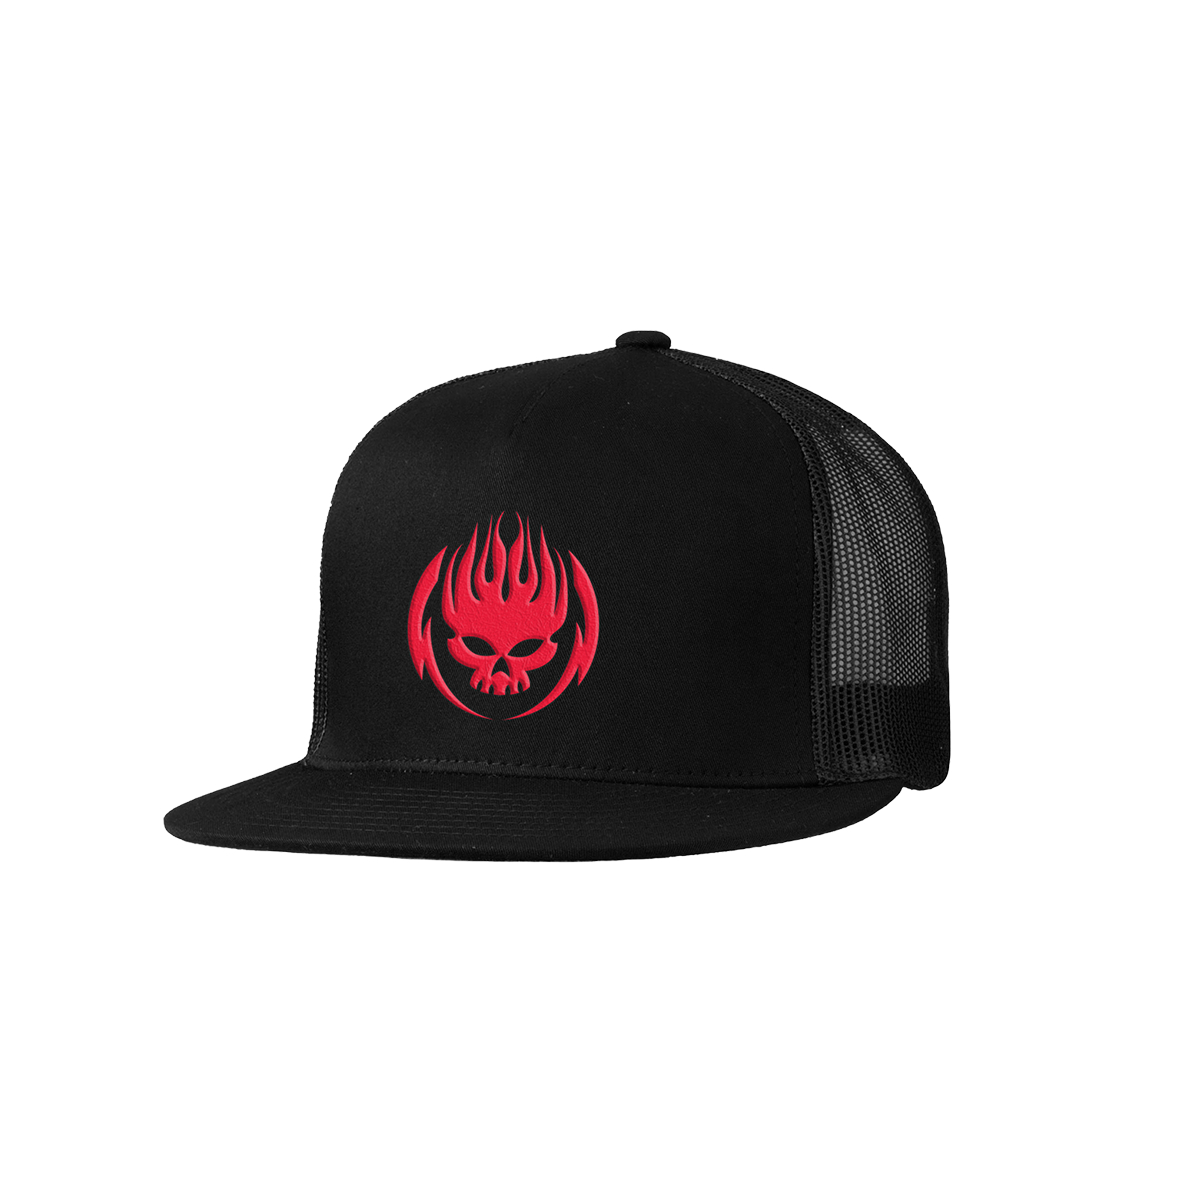 The Offspring Red Logo Black Trucker Hat